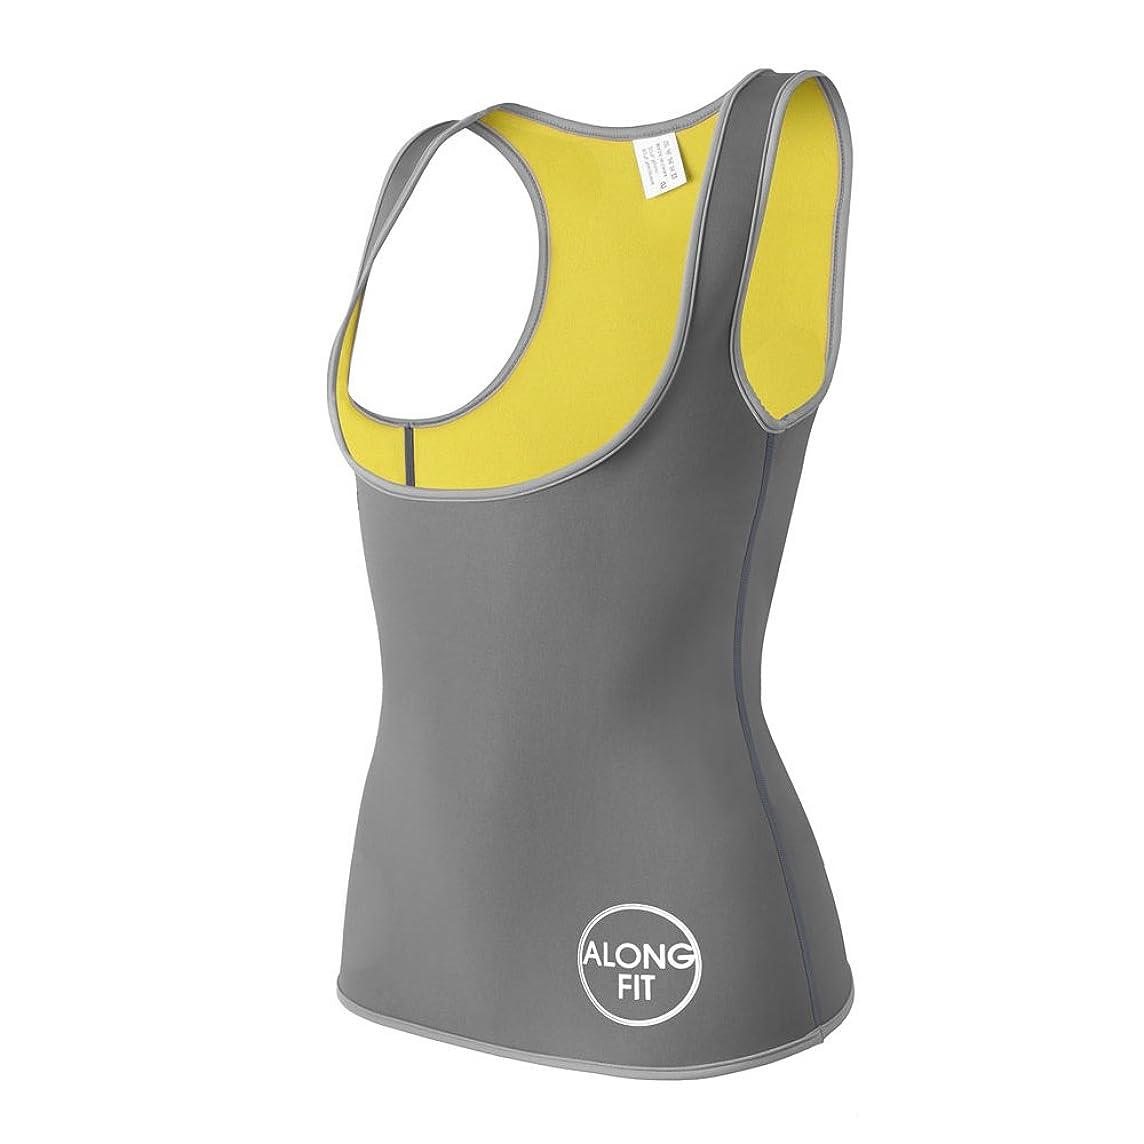 ALONG FIT Neoprene Waist Trainer for Women Sauna Vest Corset for Weight Loss Hot Slimming Sweat Vest Tank Top